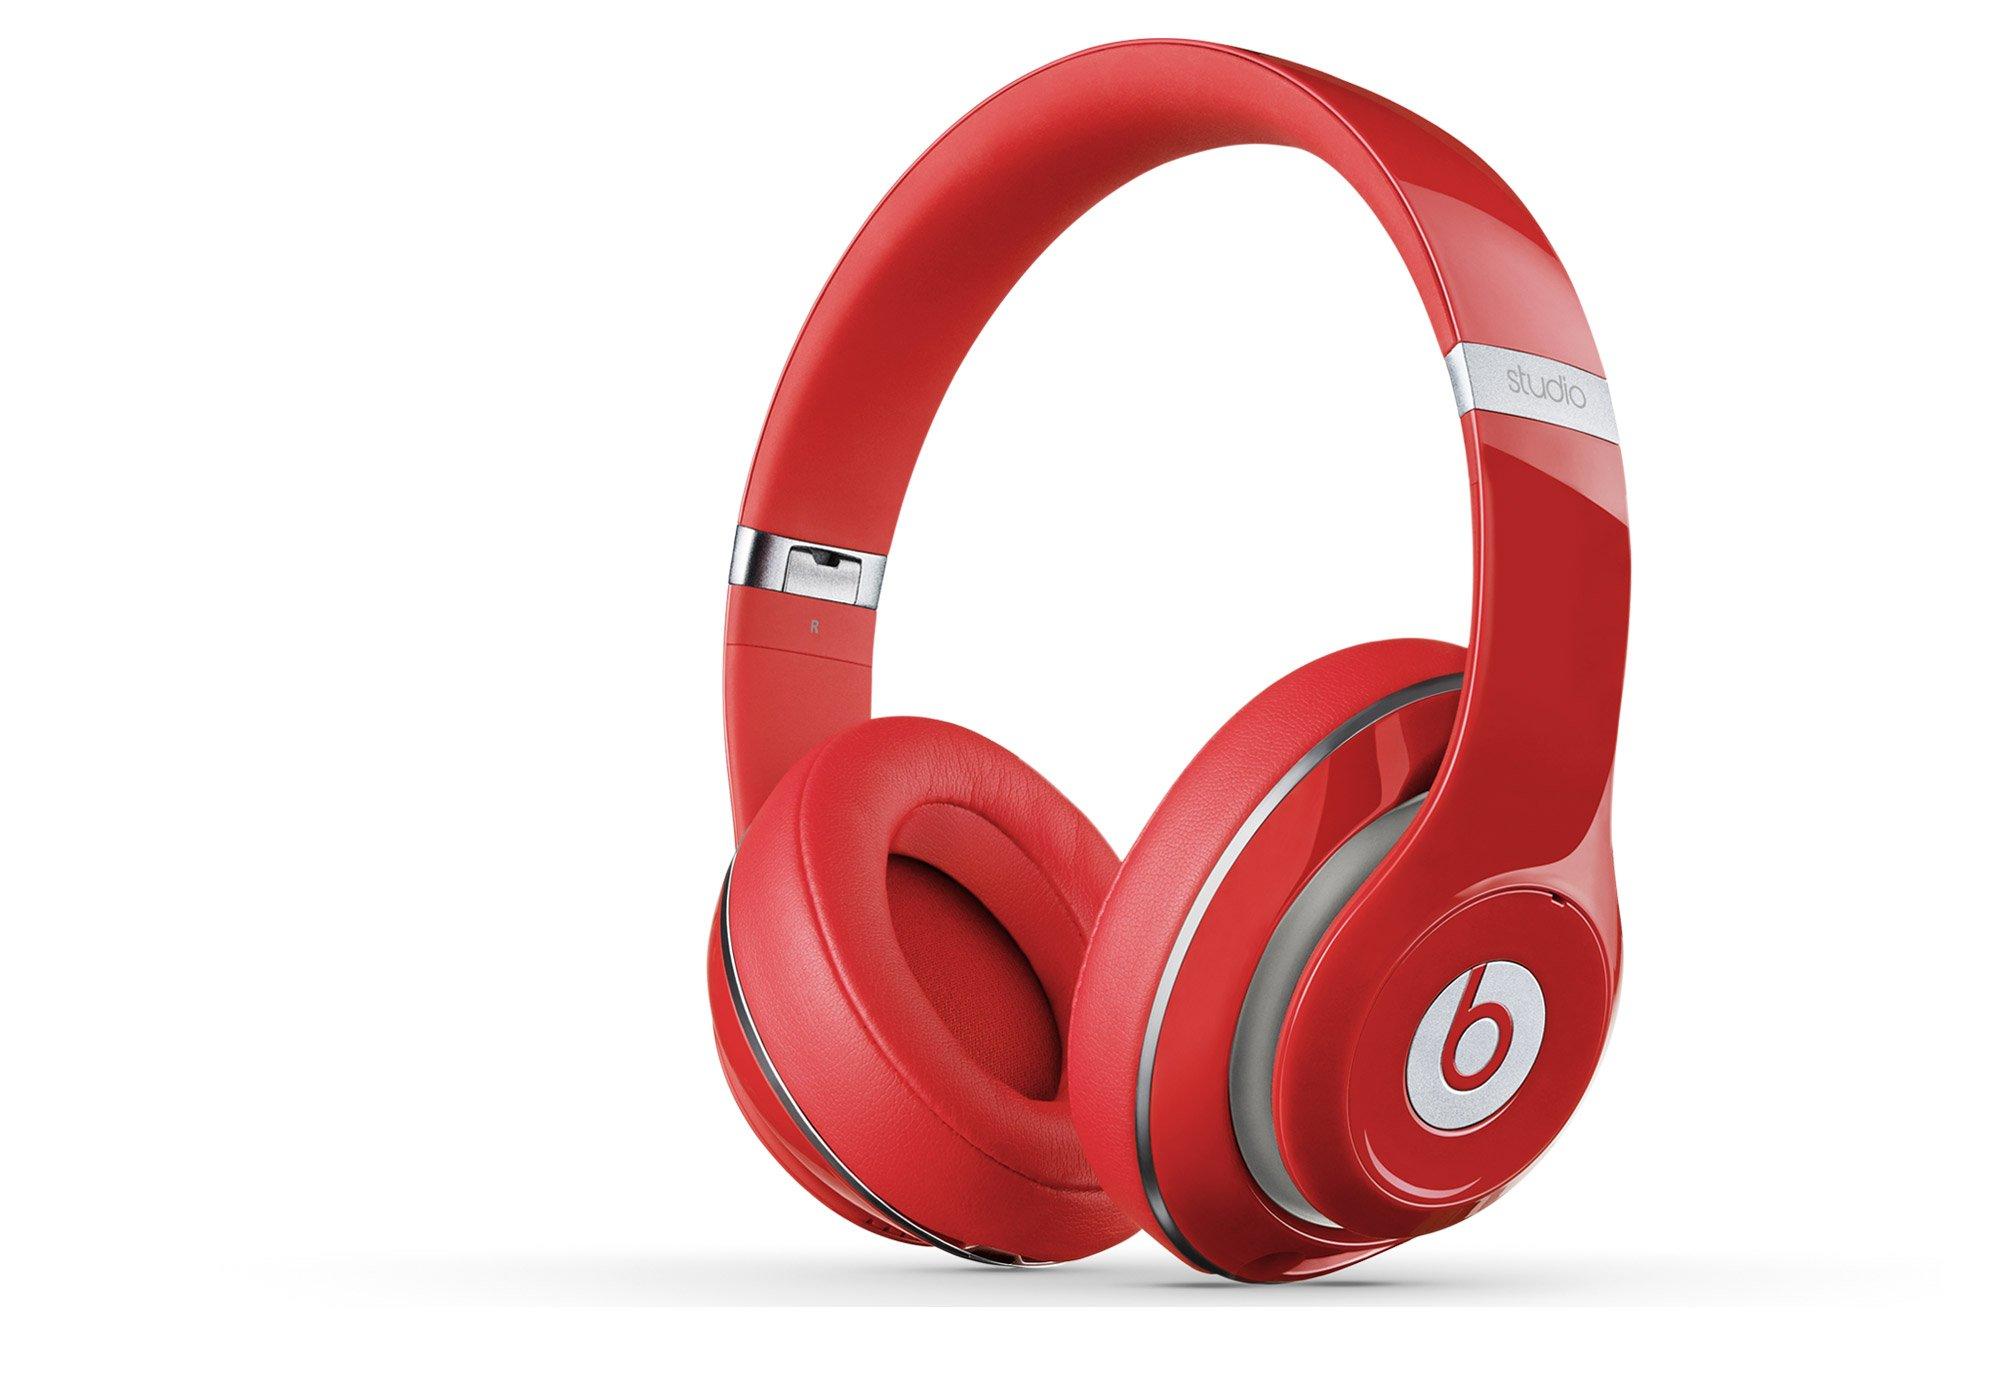 beats耳机官网_beats studio官网_beats耳机怎么看是第几代_微信公众号文章